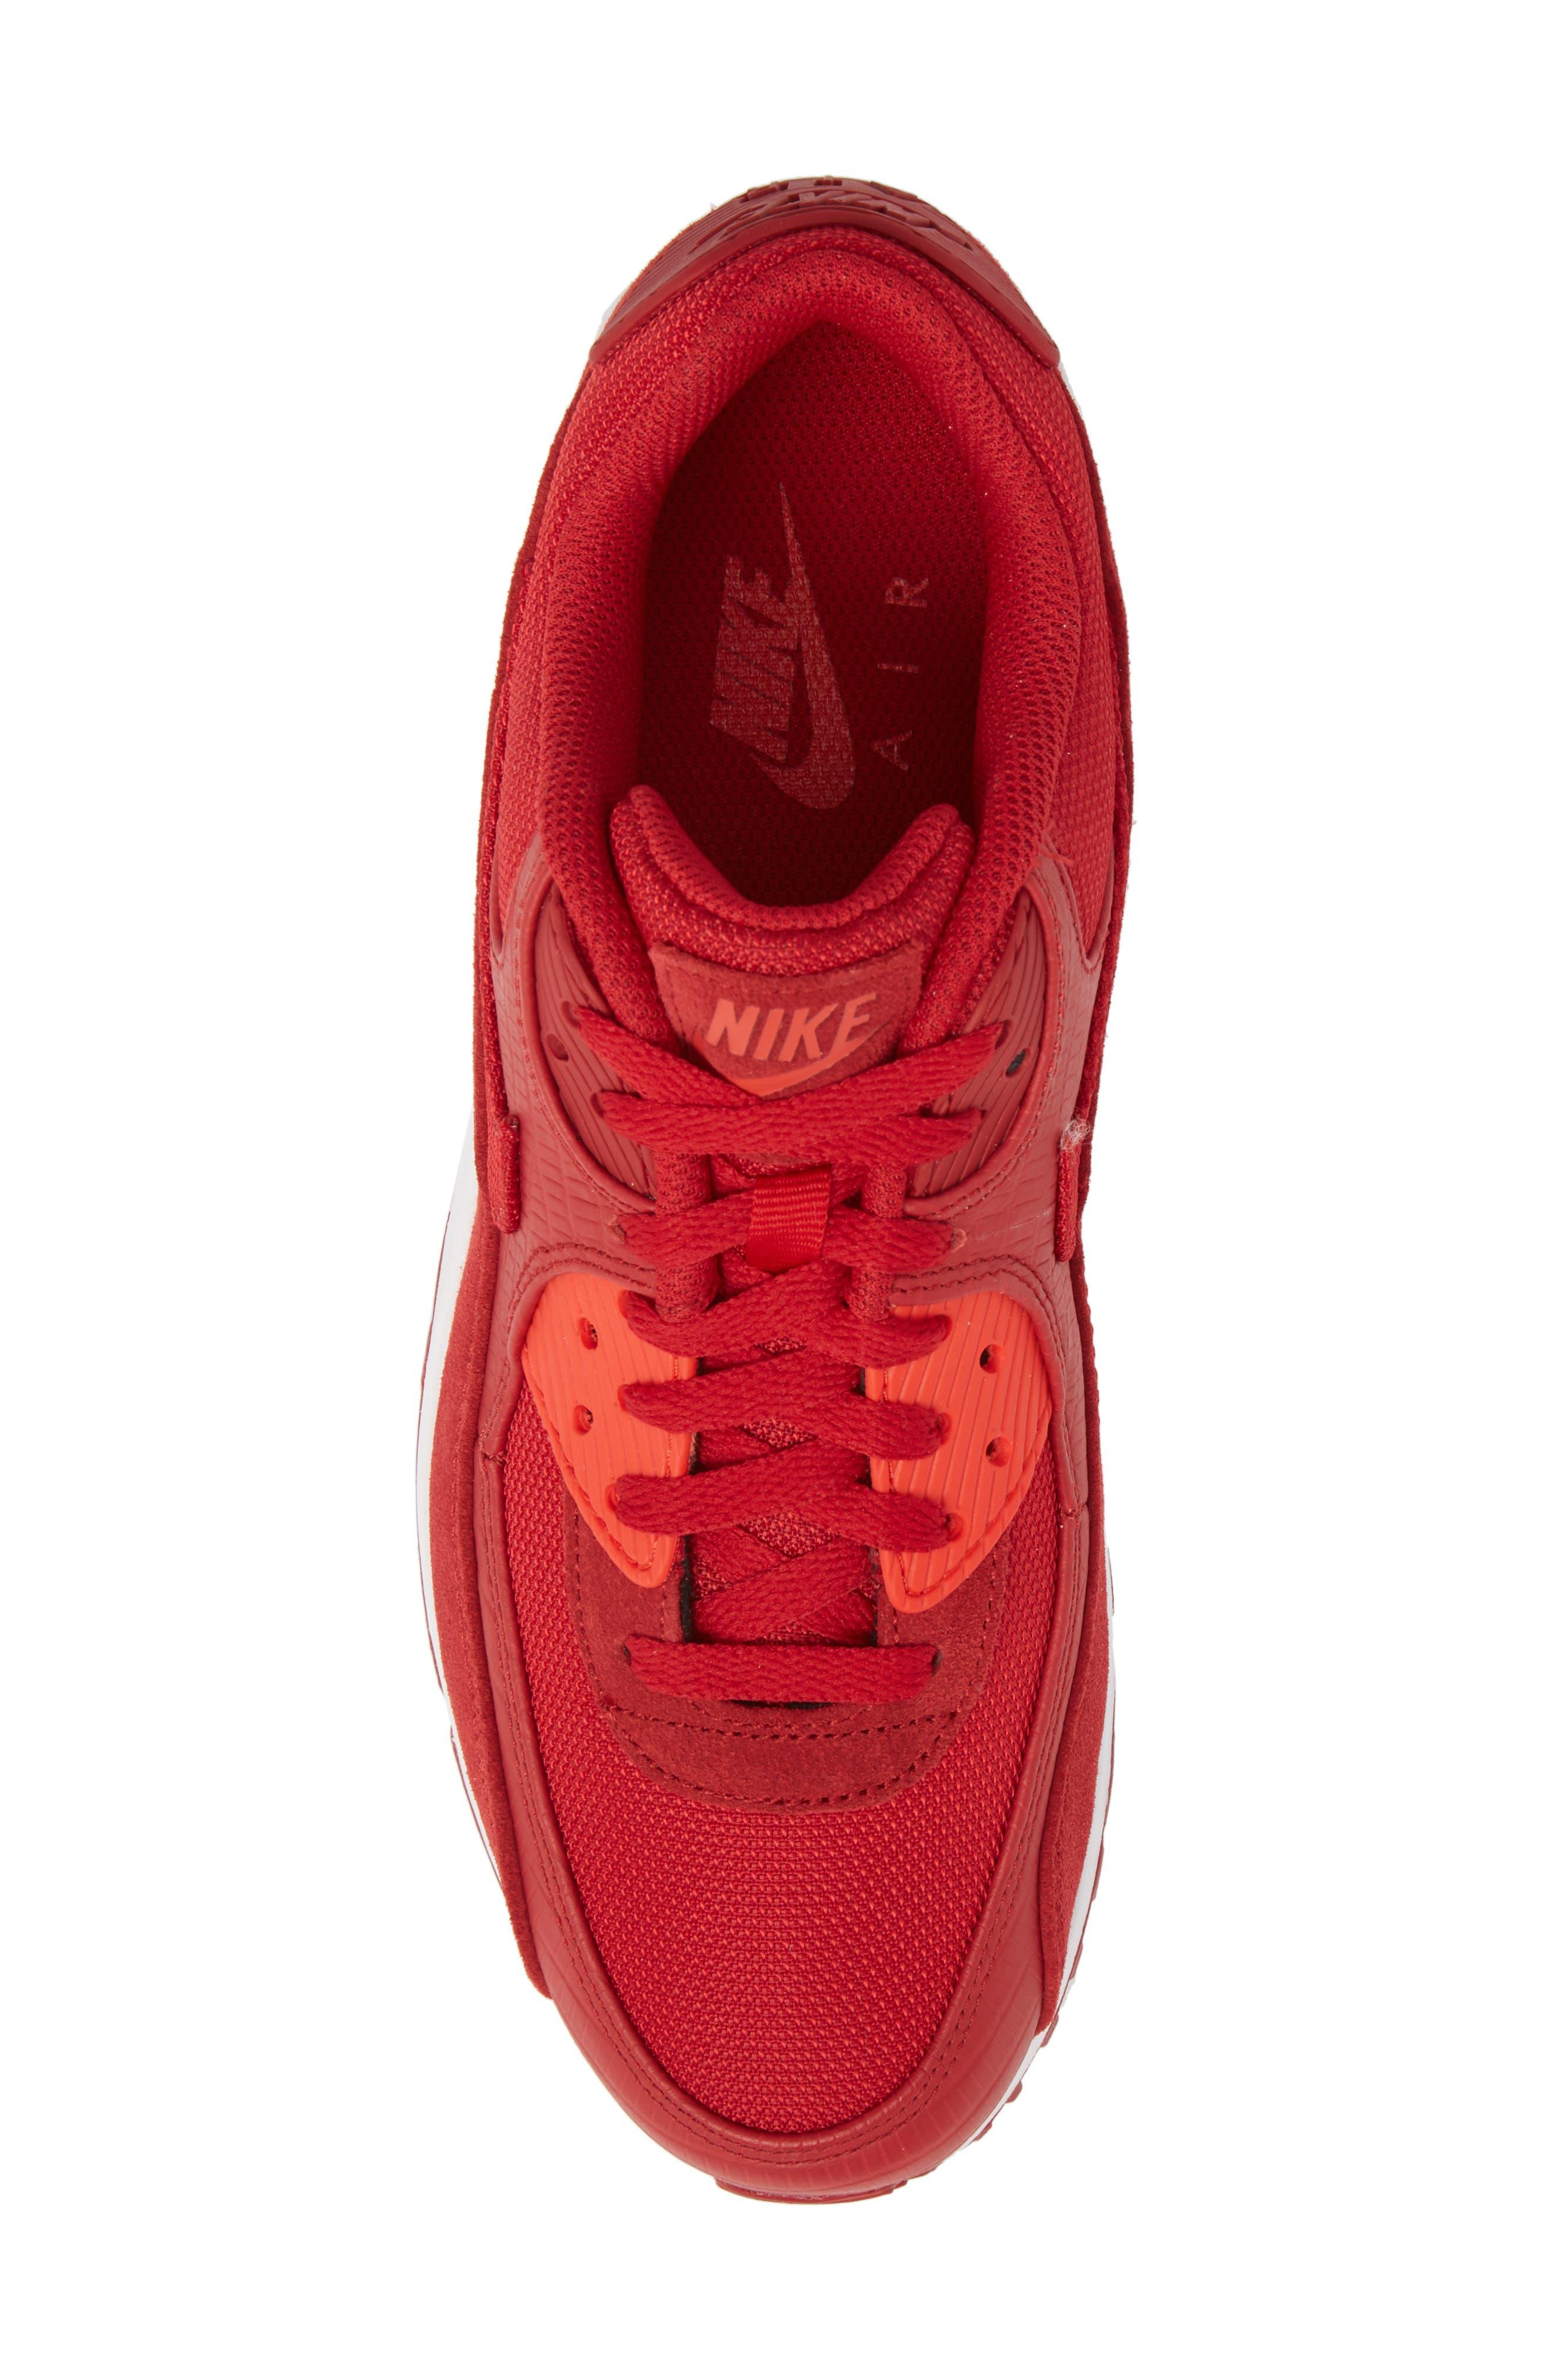 Air Max 90 Premium Sneaker,                             Alternate thumbnail 5, color,                             Gym Red/ White